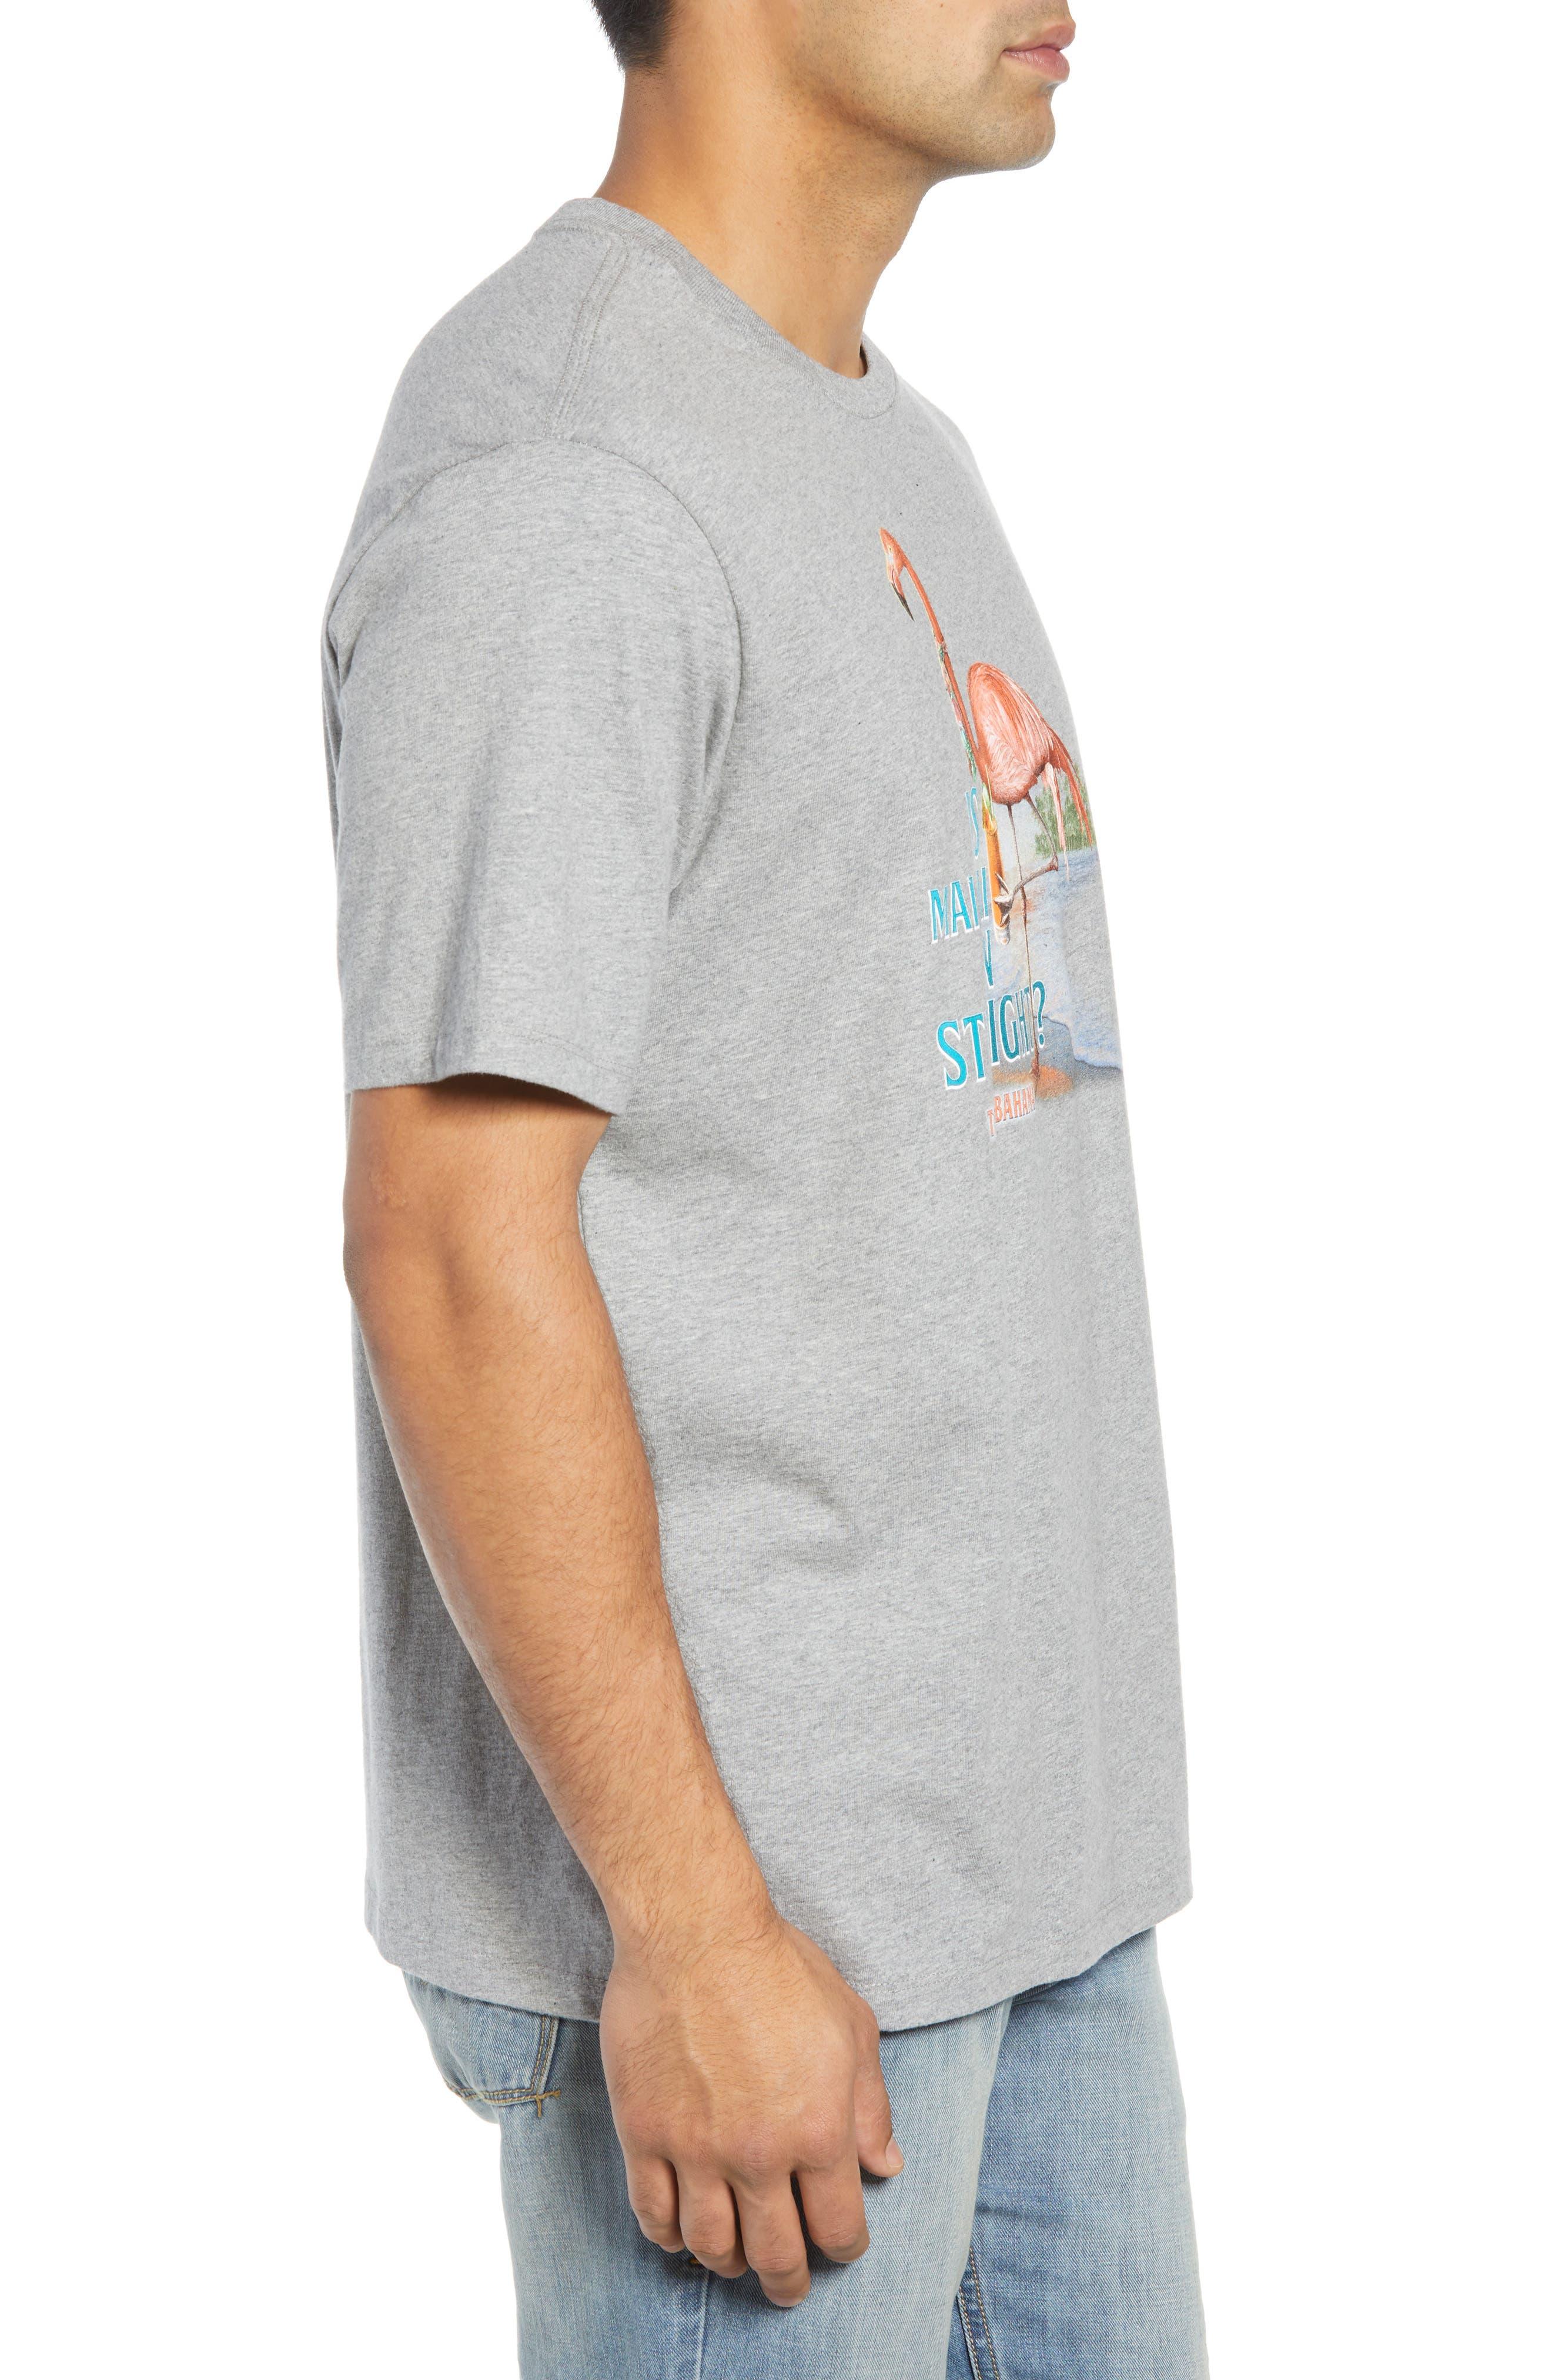 Is Mai Tai on Straight? T-Shirt,                             Alternate thumbnail 3, color,                             GREY HEATHER